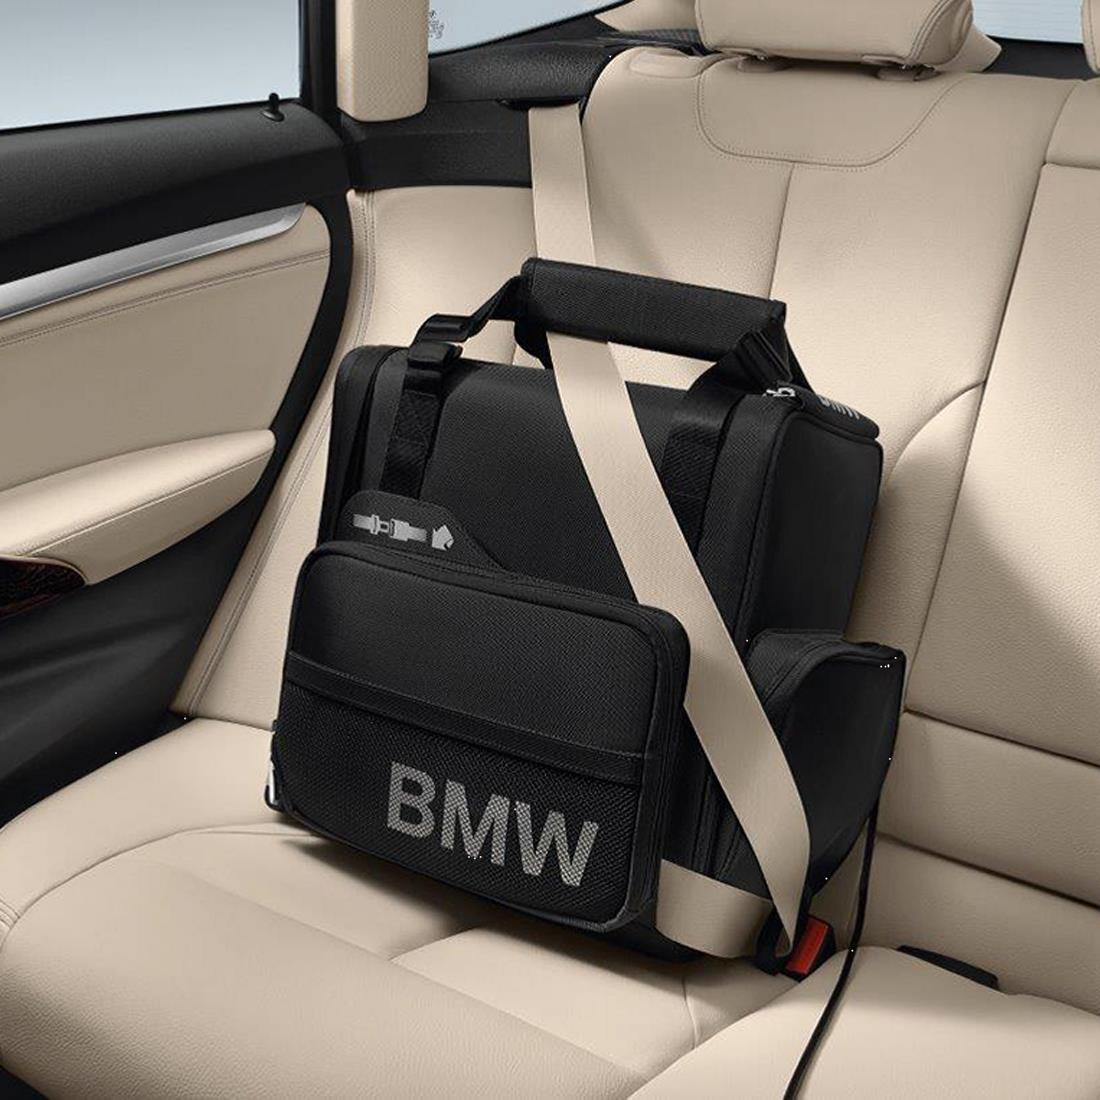 BMW Cool Bag